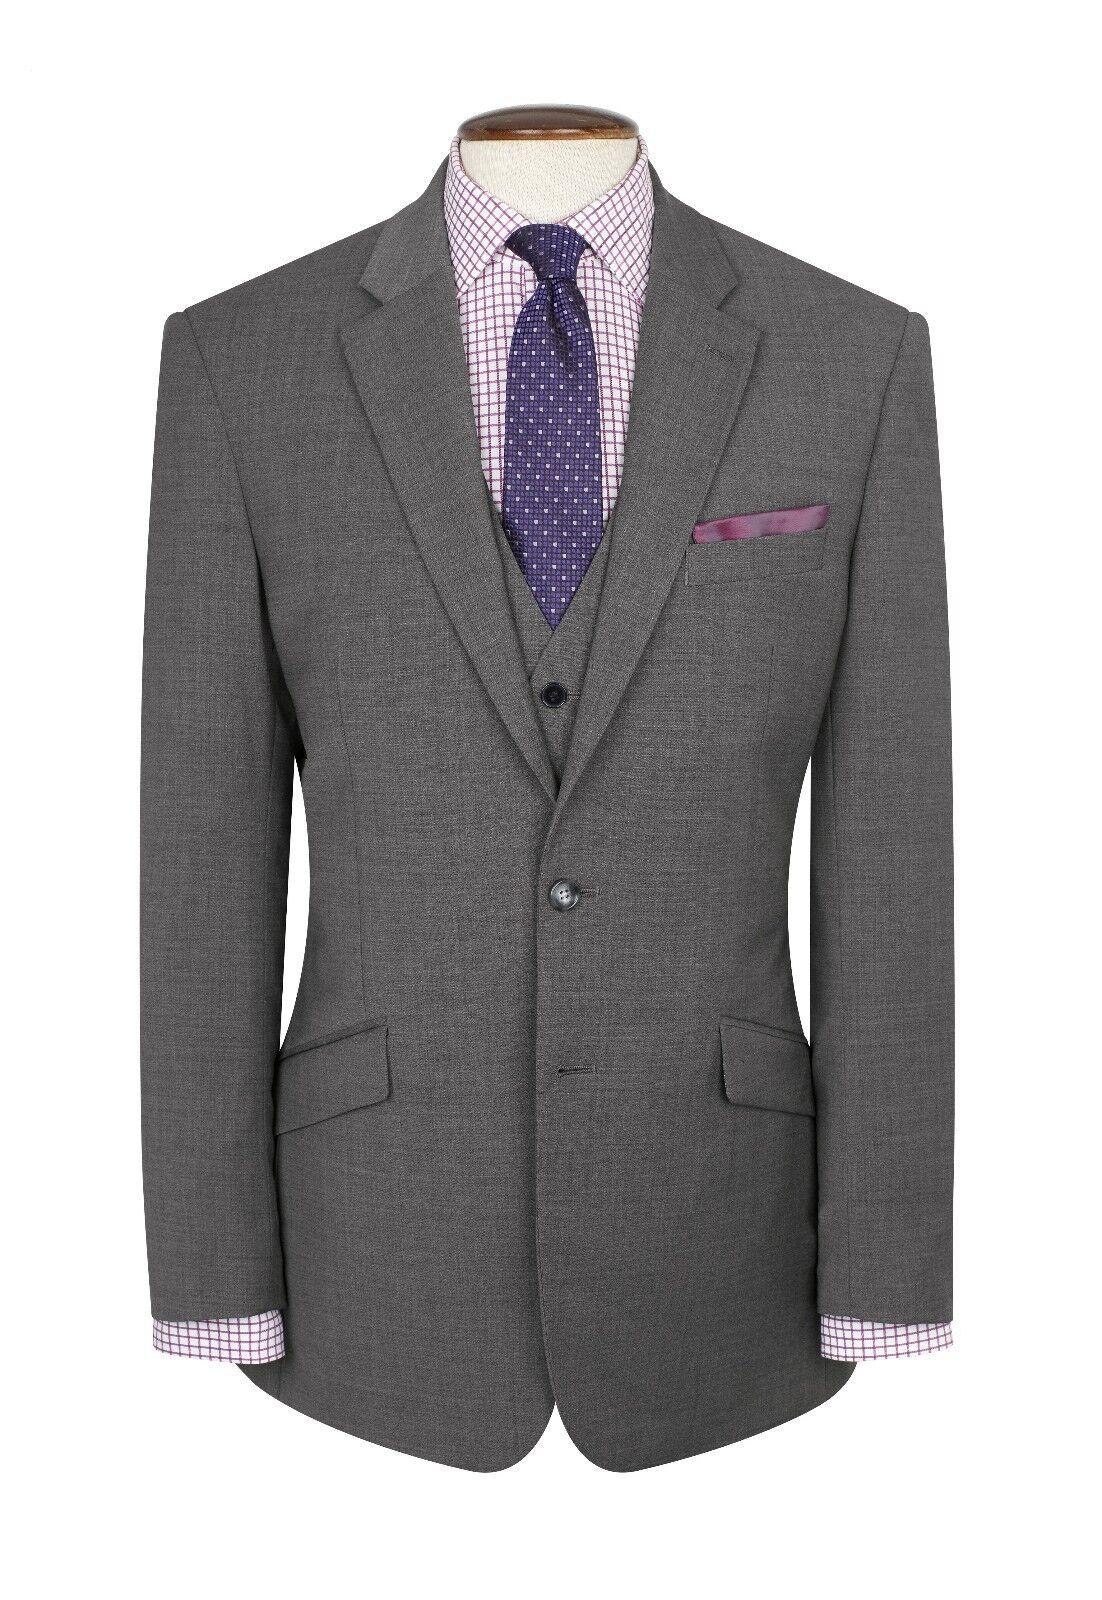 New mens Brook Taverner Light Grau suit suit suit in Größes up to 52 chest SAVE OVER c79834